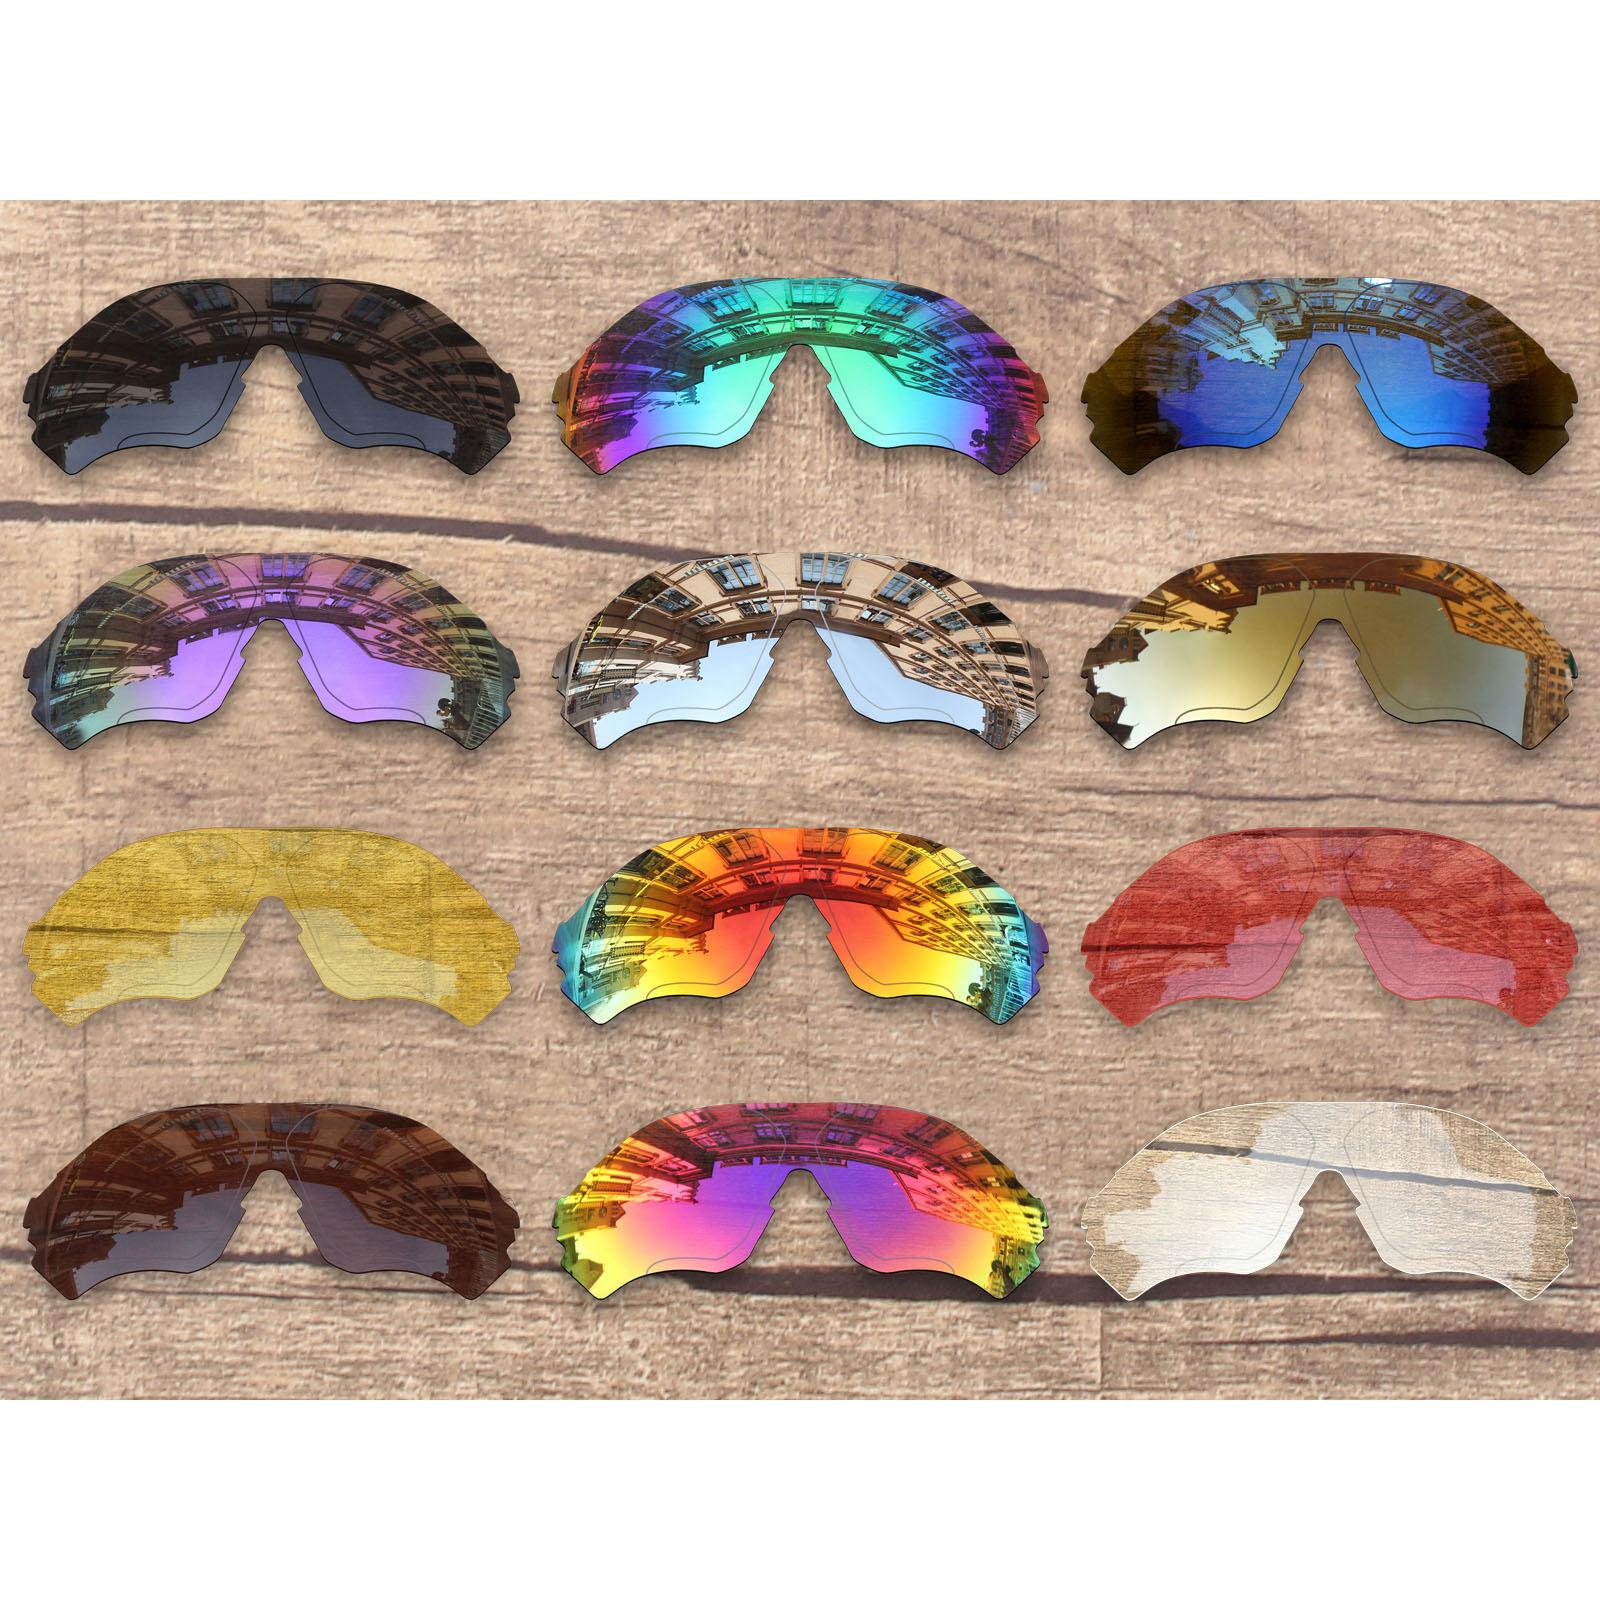 Vonxyz Multiple Choices Polarized Replacement Lenses & Ear Socks & Nose Pads For-Oakley EVZero Range OO9327 Sunglasses